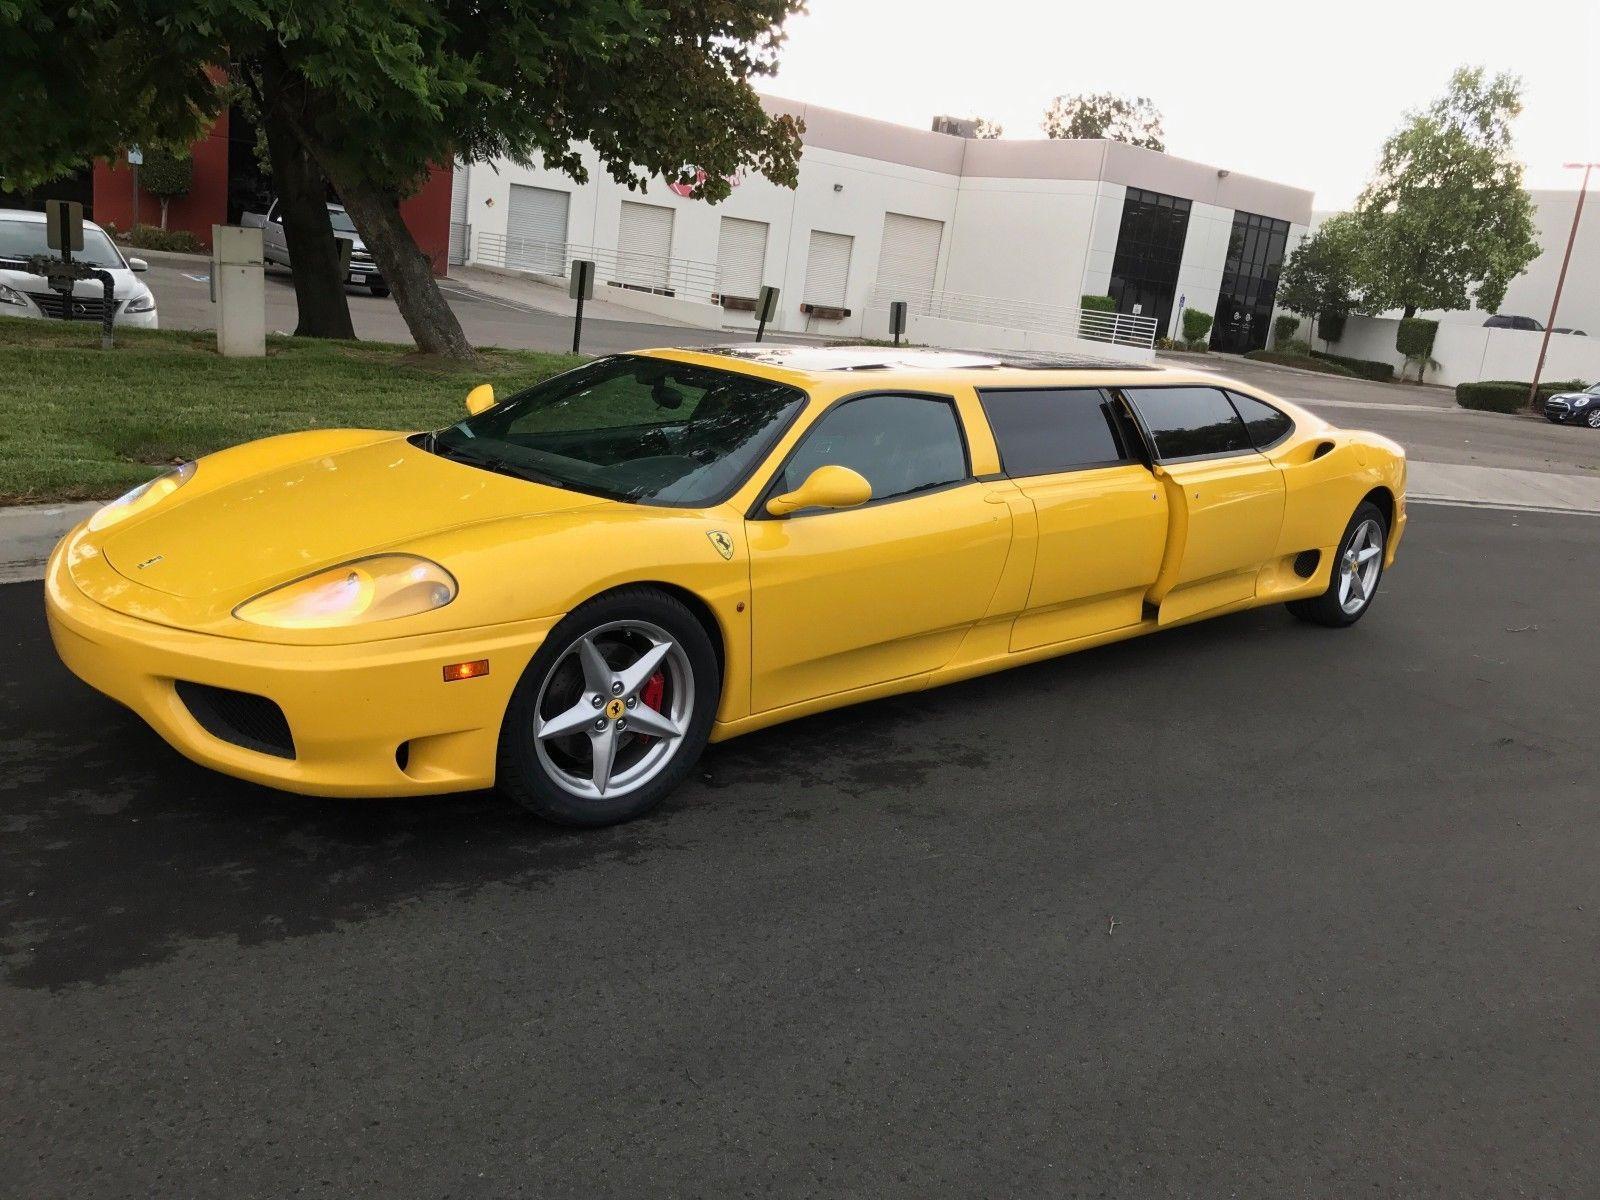 Ferrari 360 transformat in limuzina - Ferrari 360 transformat in limuzina